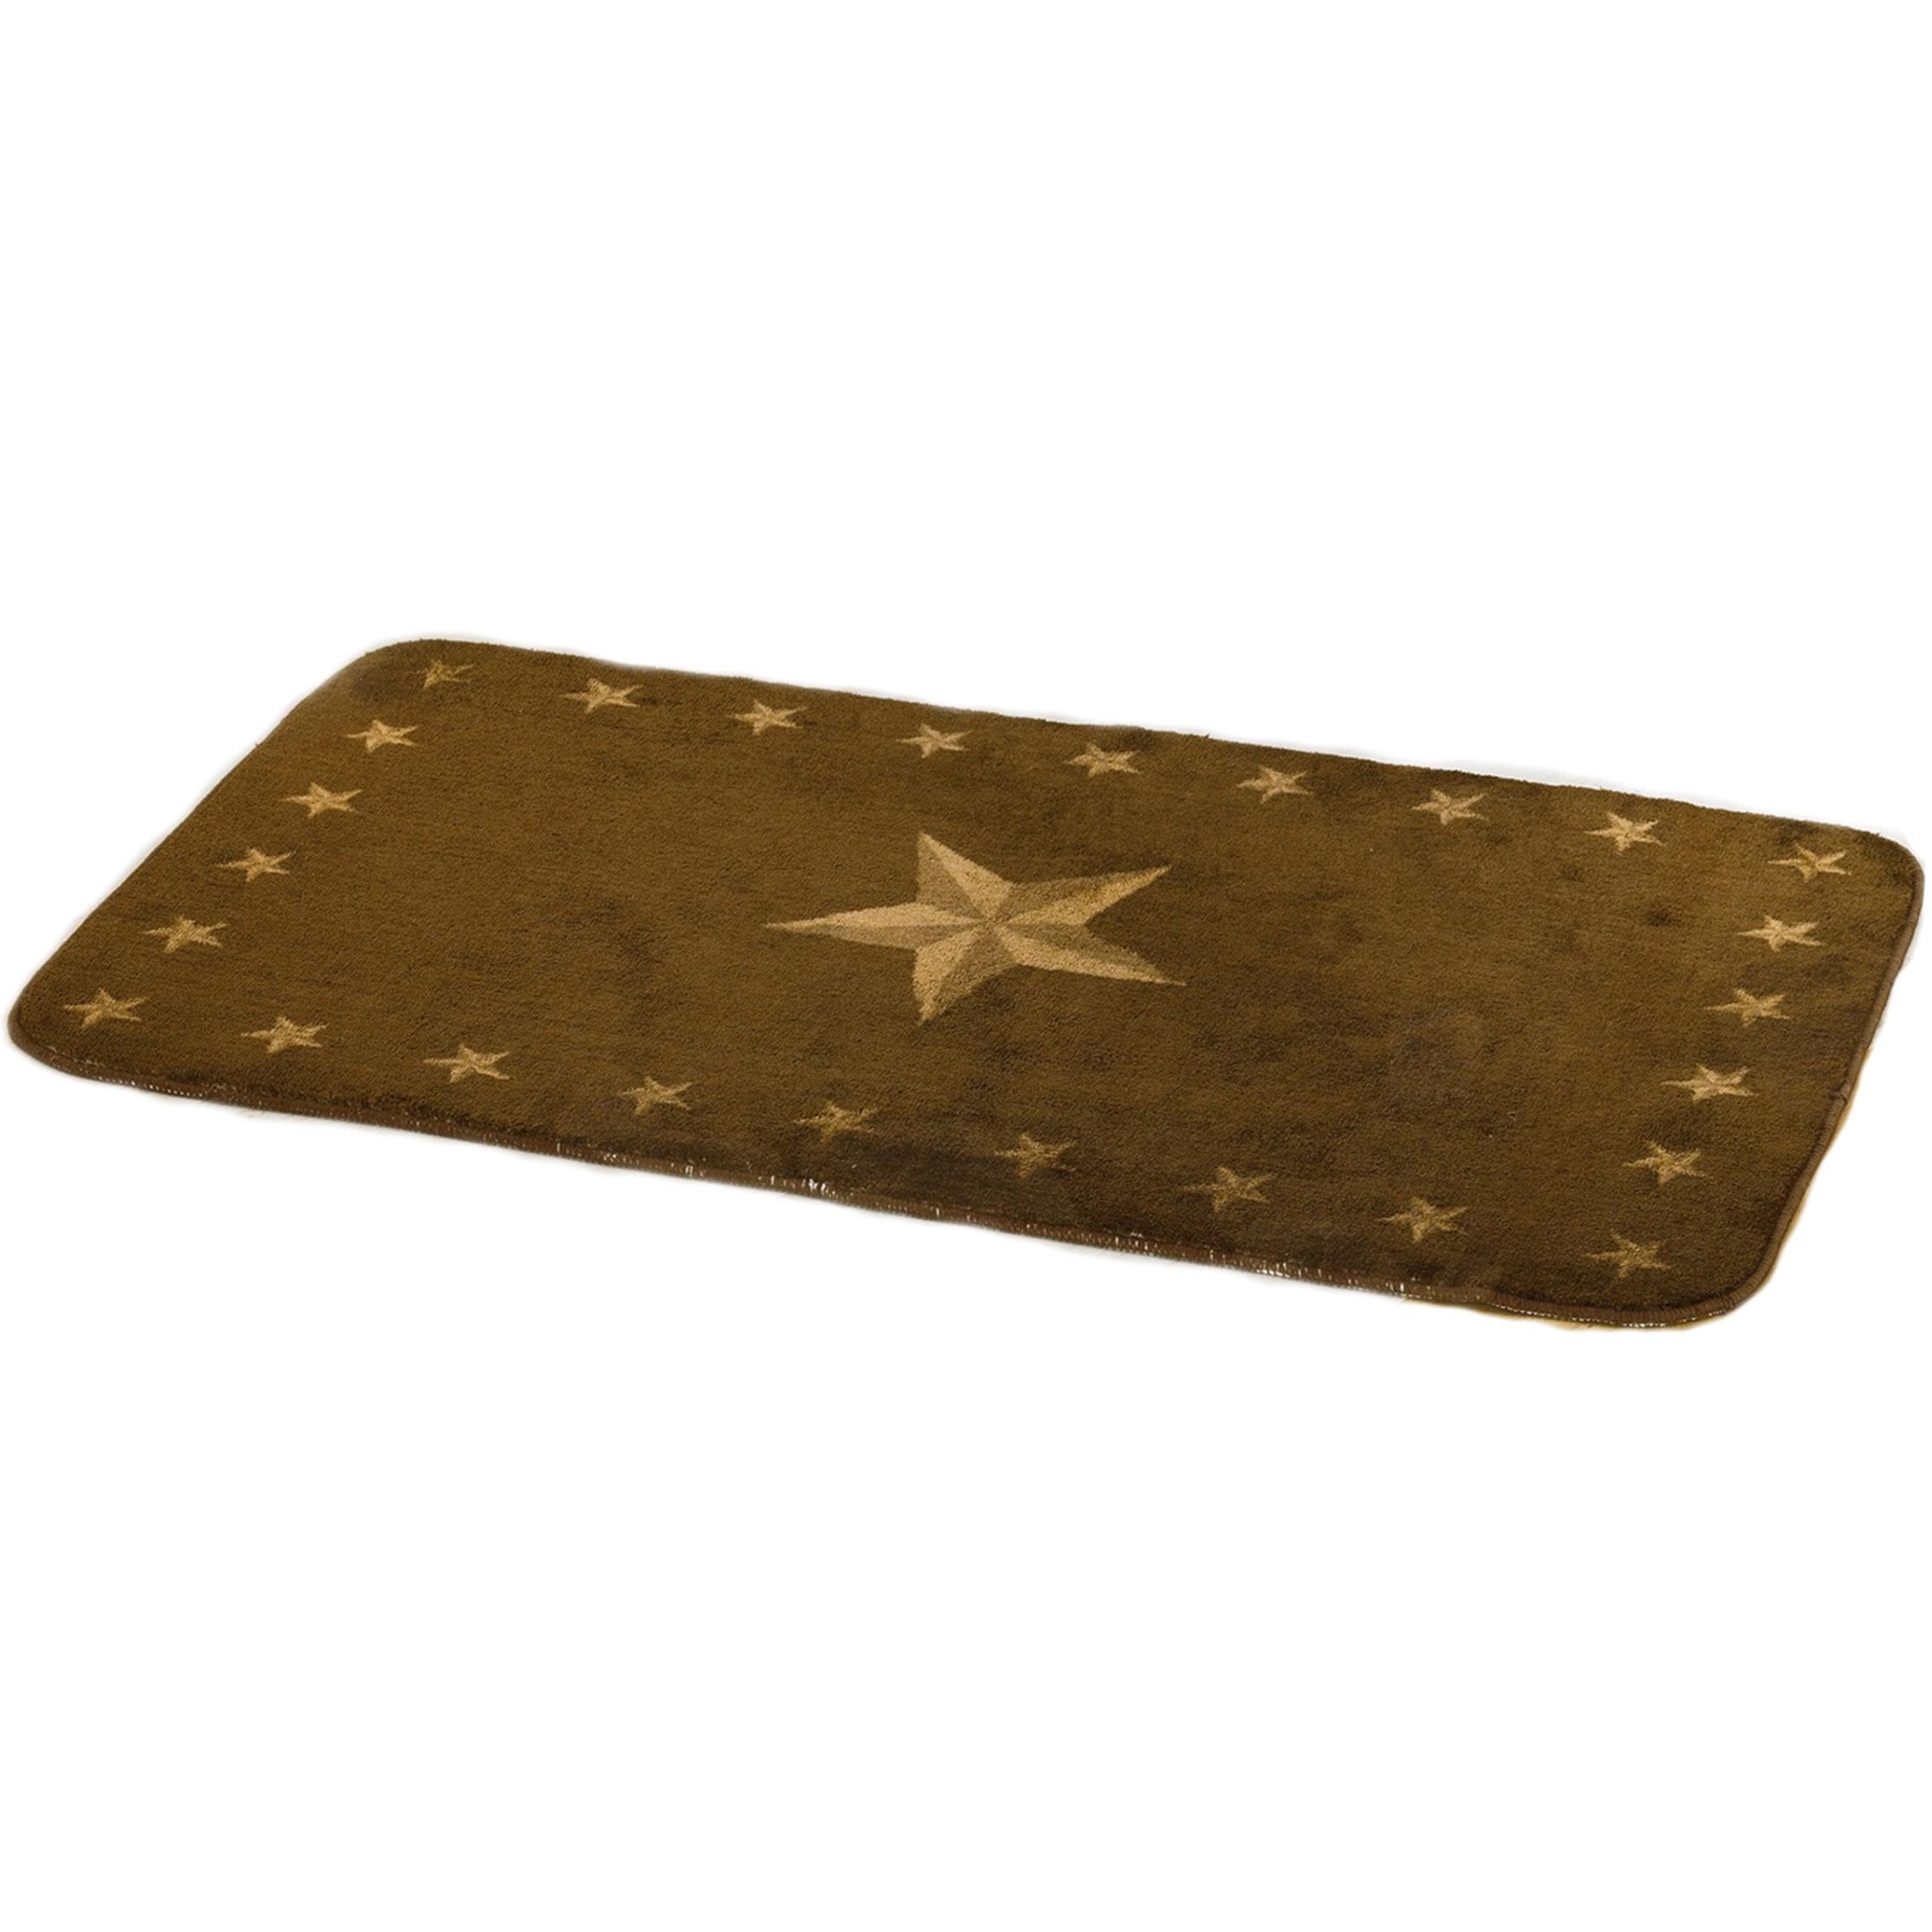 HiEnd Accents One Star Dark Chocolate 30x50-inch Acrylic ...